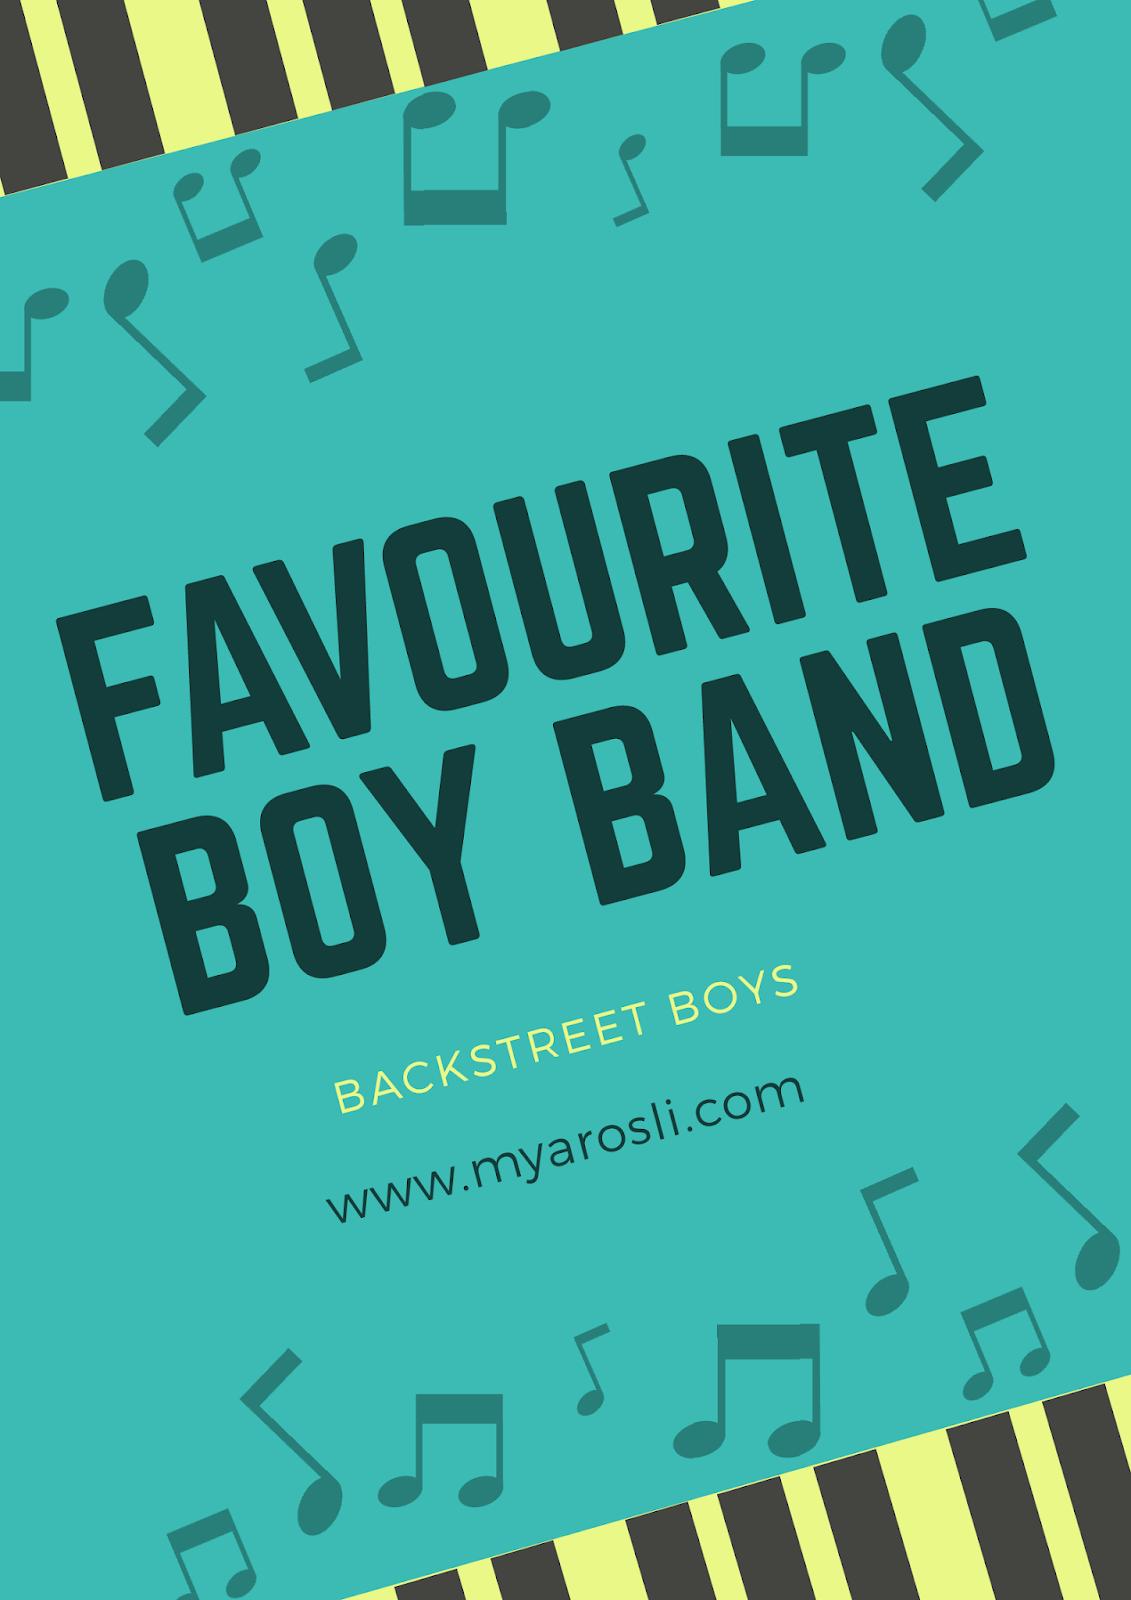 Favourite Boy Band